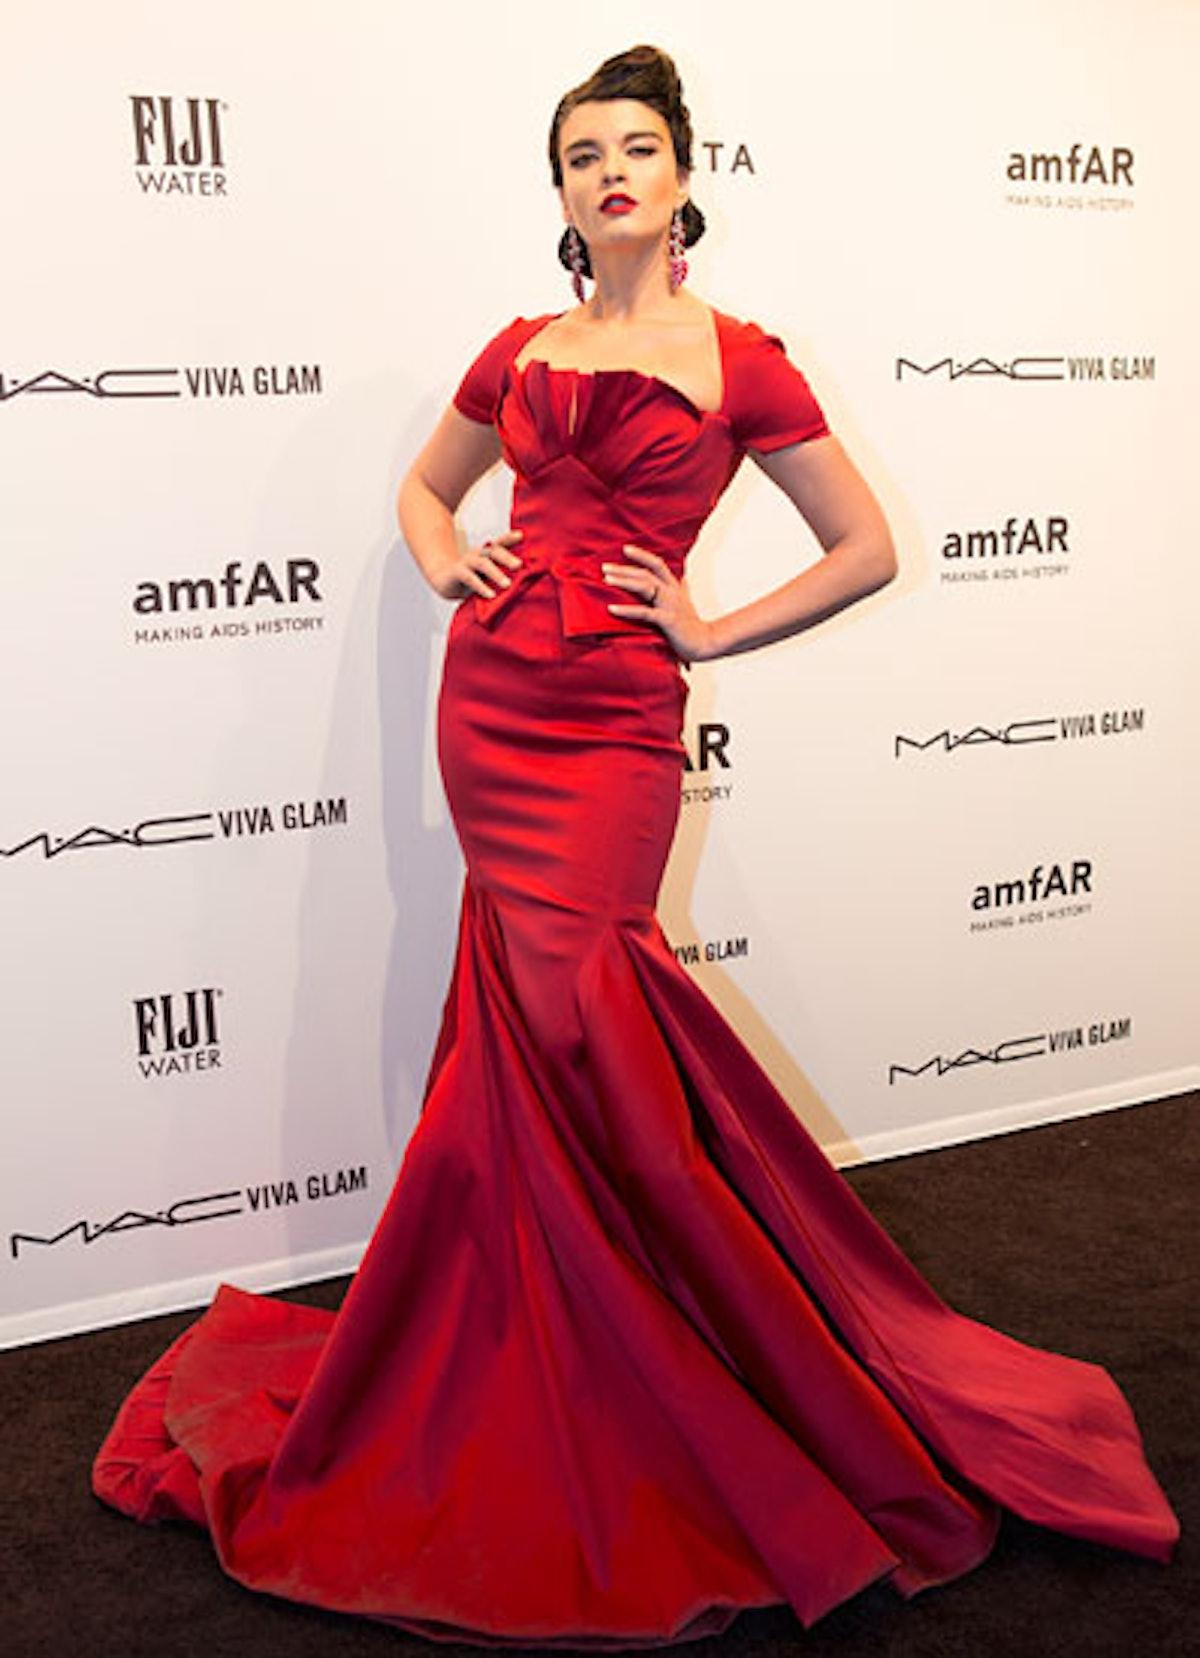 pass-amfar-2013-celebrities-02-v.jpg